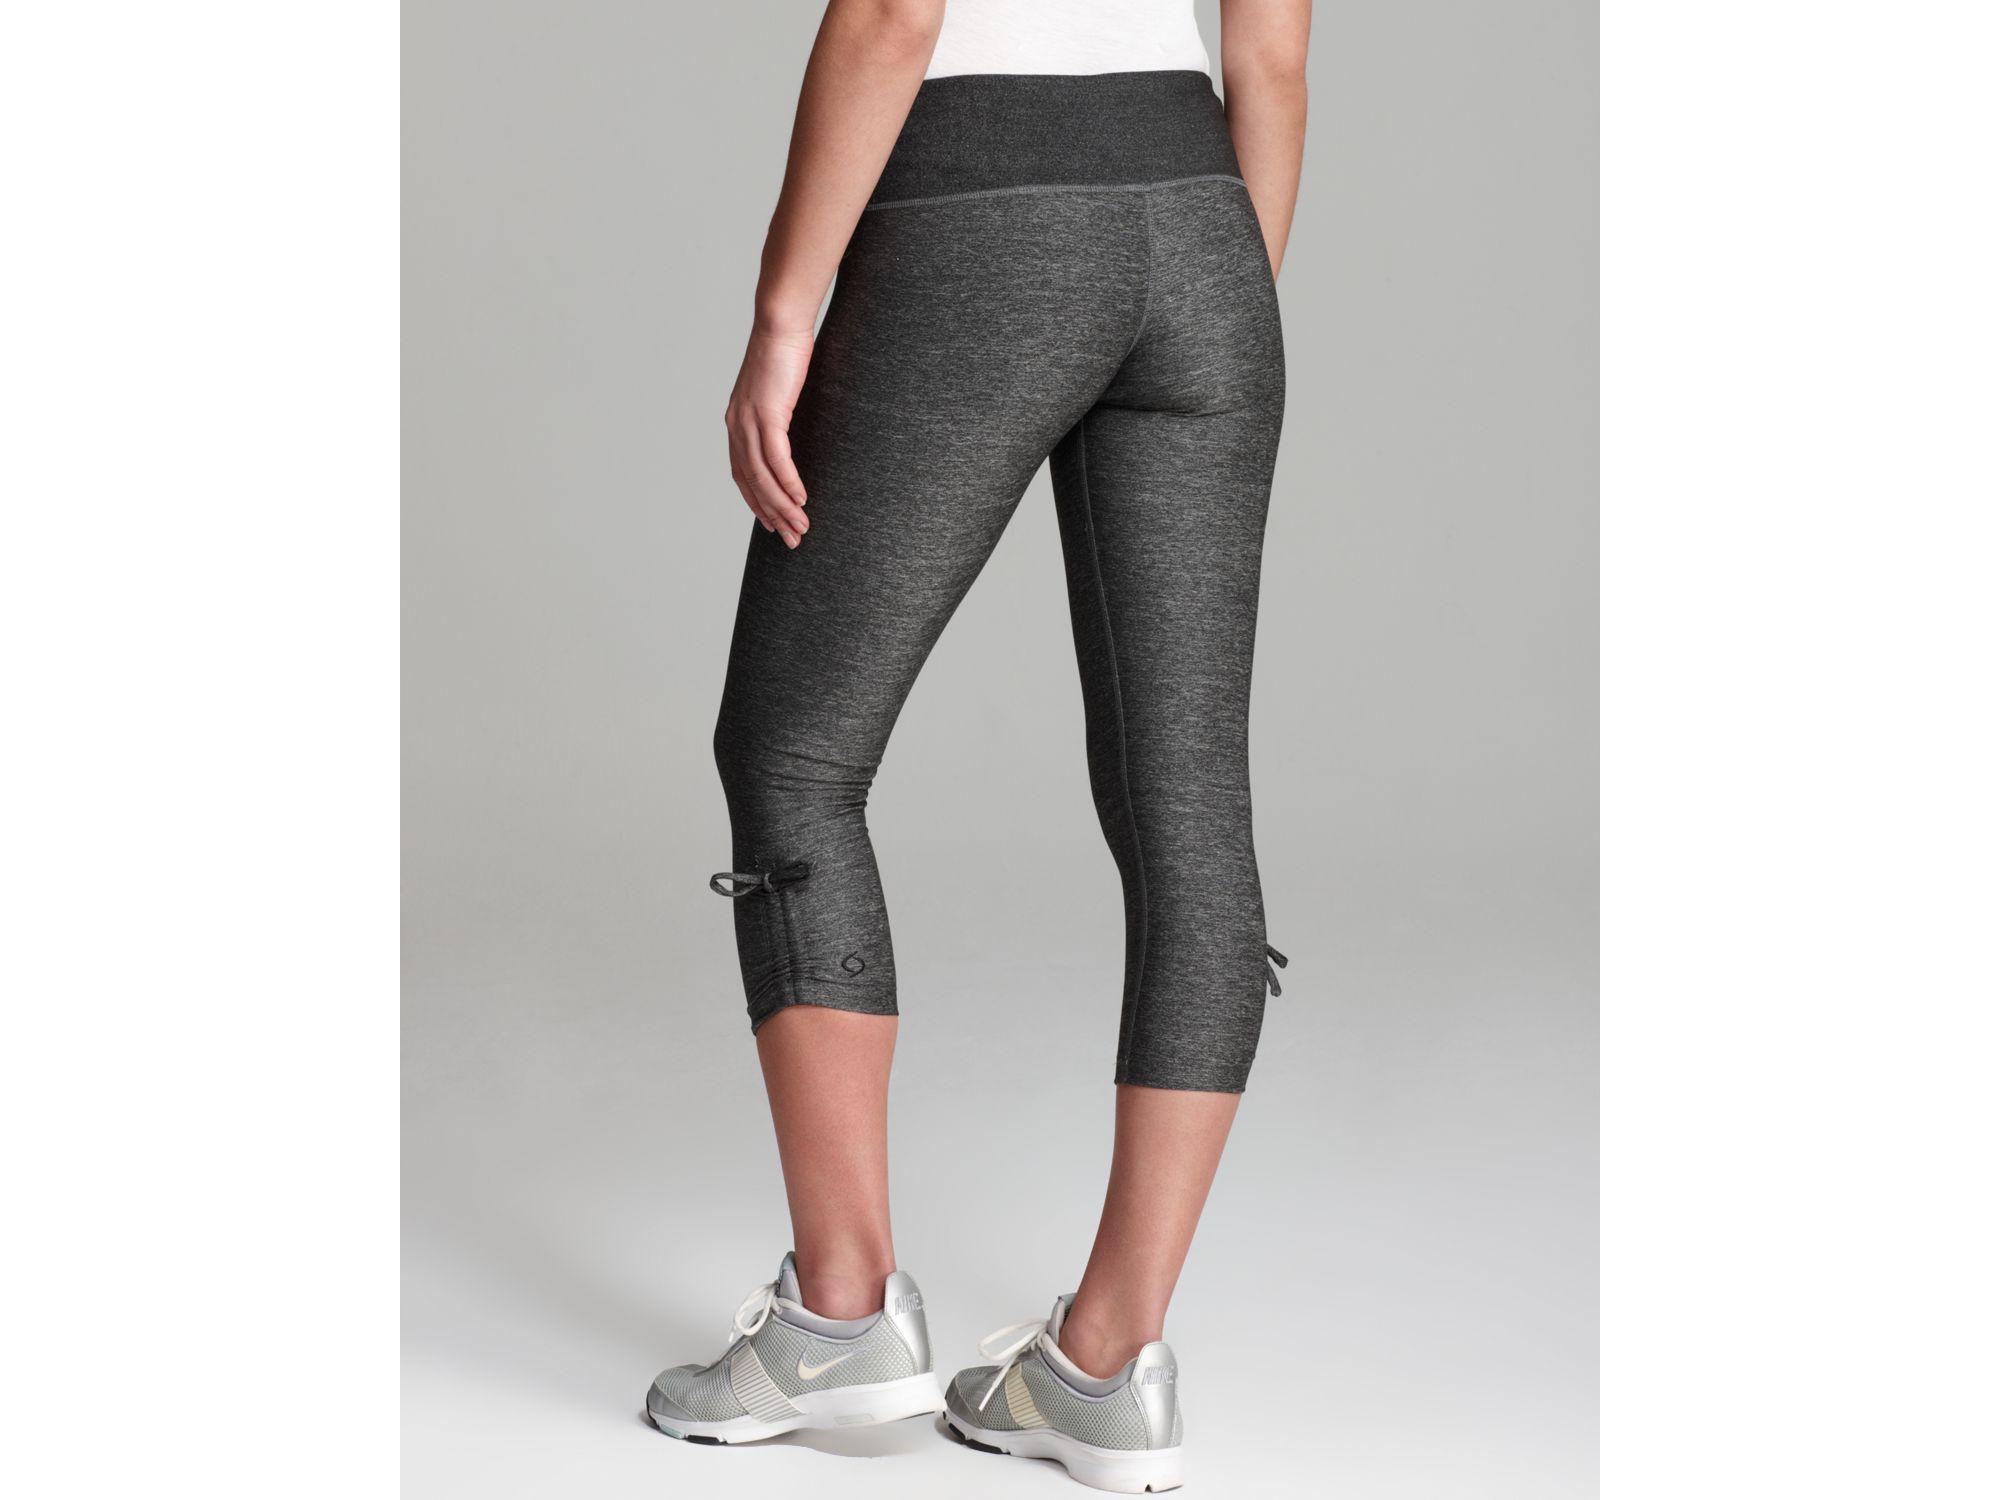 com women gym pants comfort s urban youtube watch swimoutlet tight moving comforter yoga